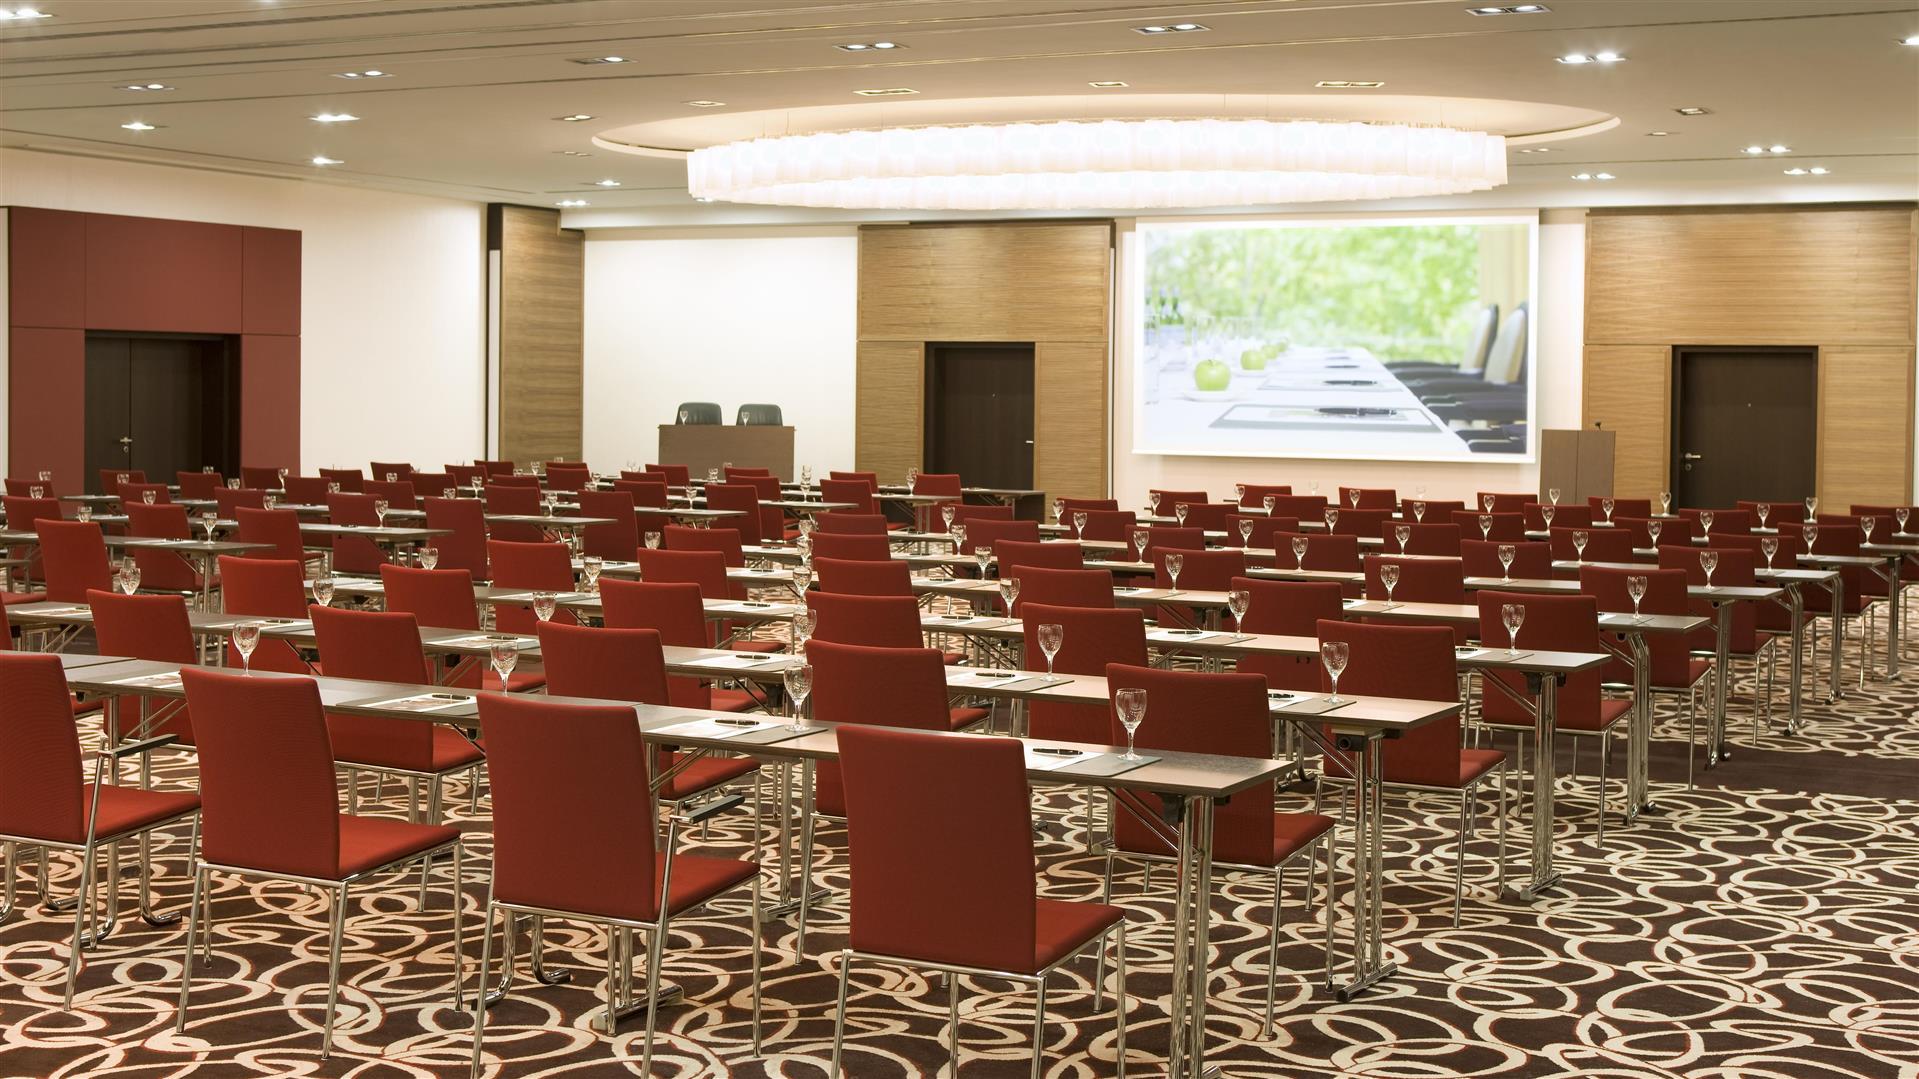 Meetings And Events At Steigenberger Hotel Berlin Berlin De